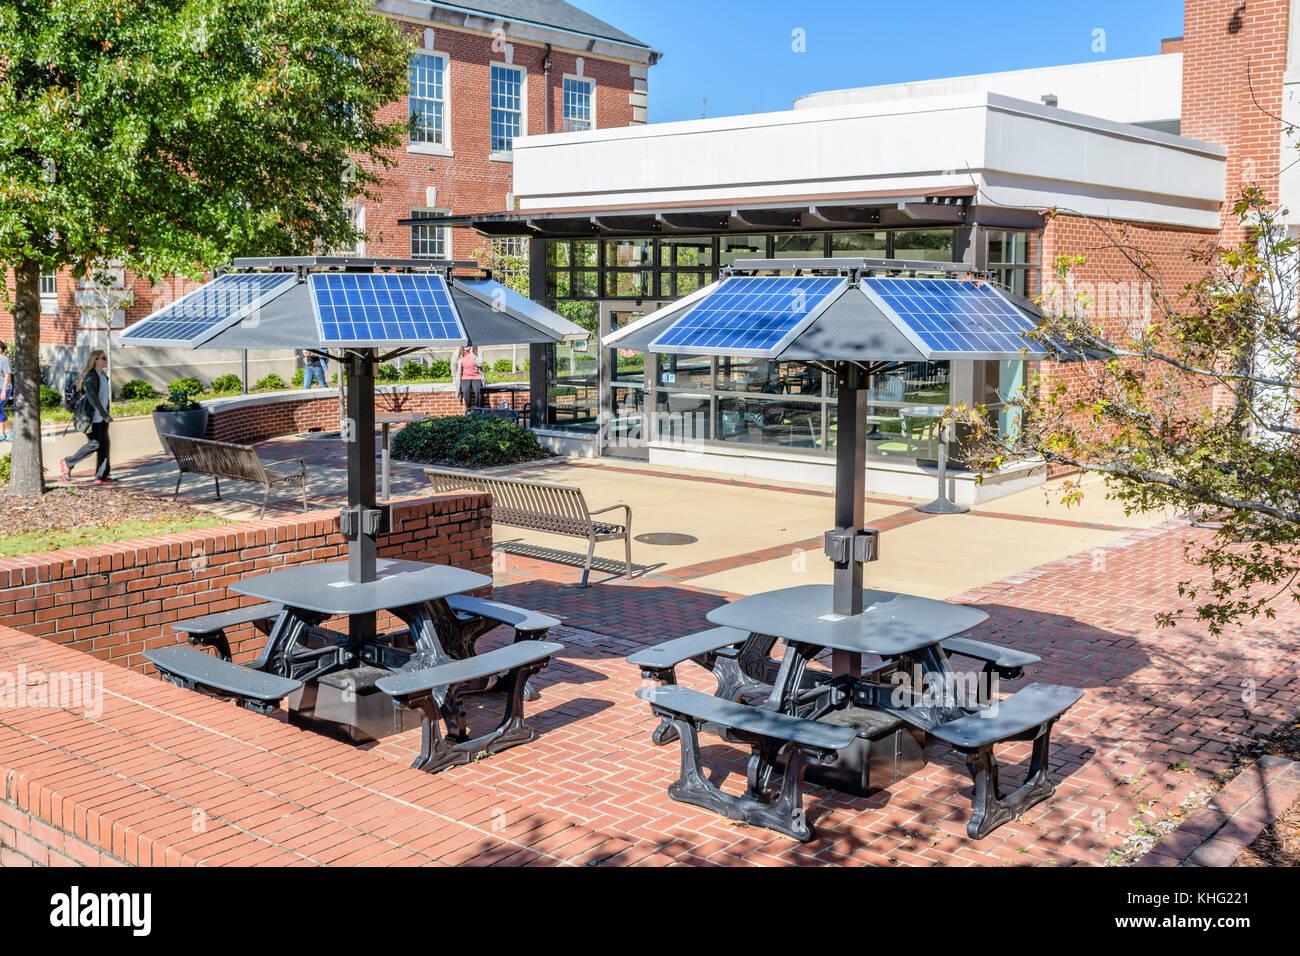 Solar Charging Station Stock Photos Solar Charging Station Stock - Solar picnic table